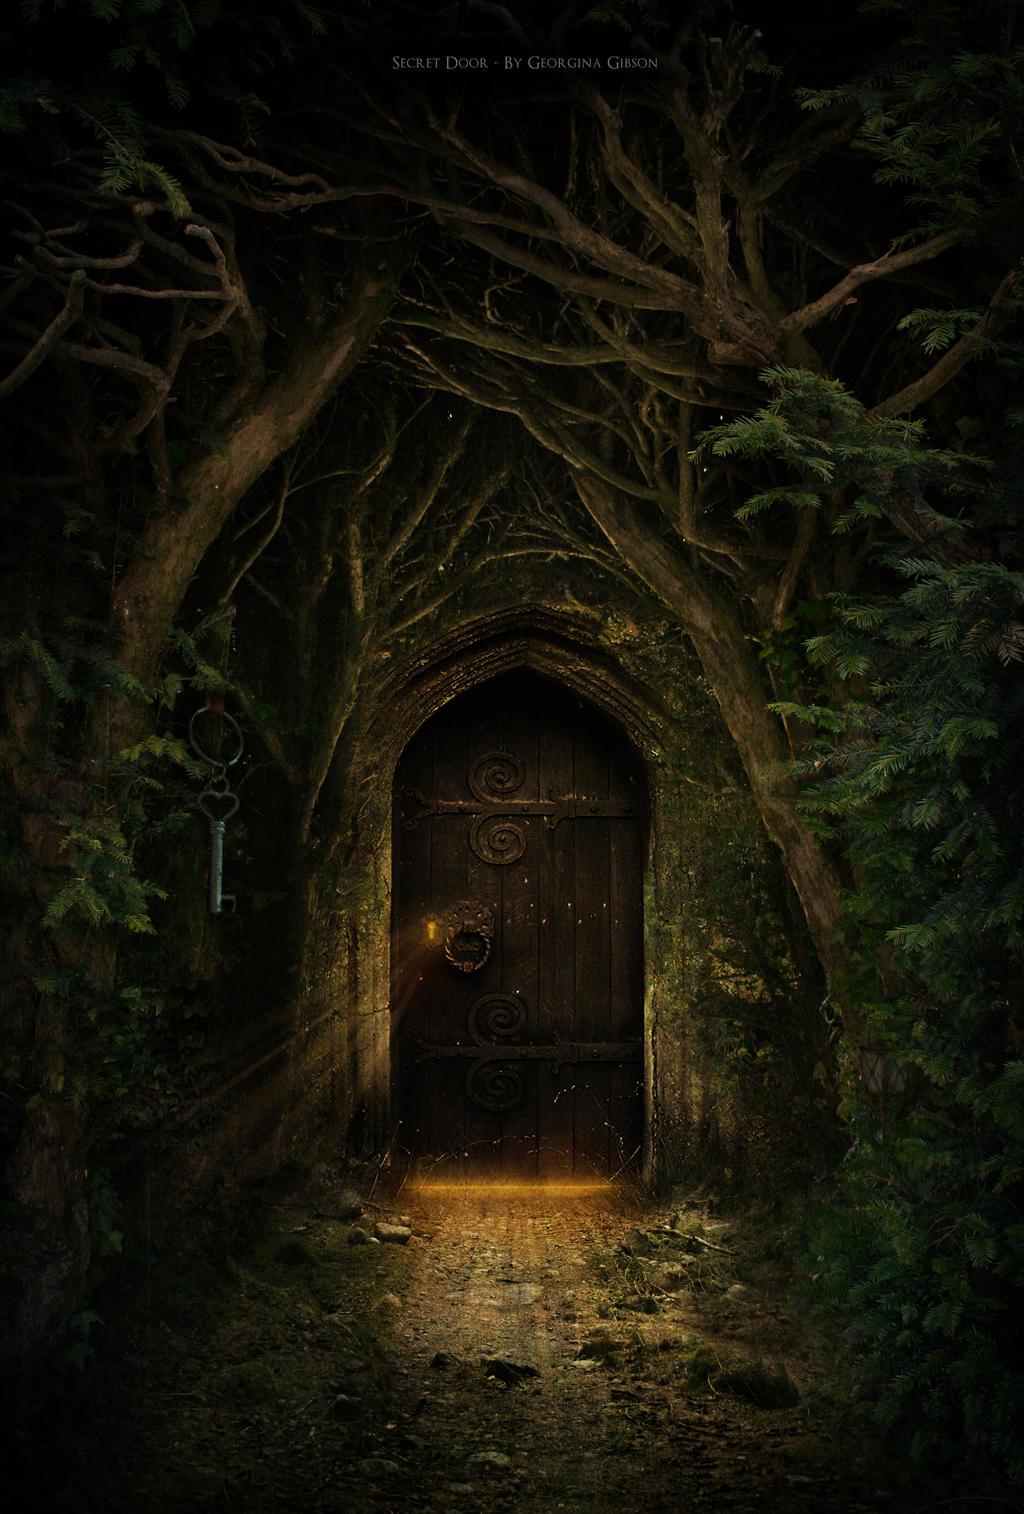 through the magic door fairies secret door by georgina gibson on deviantart